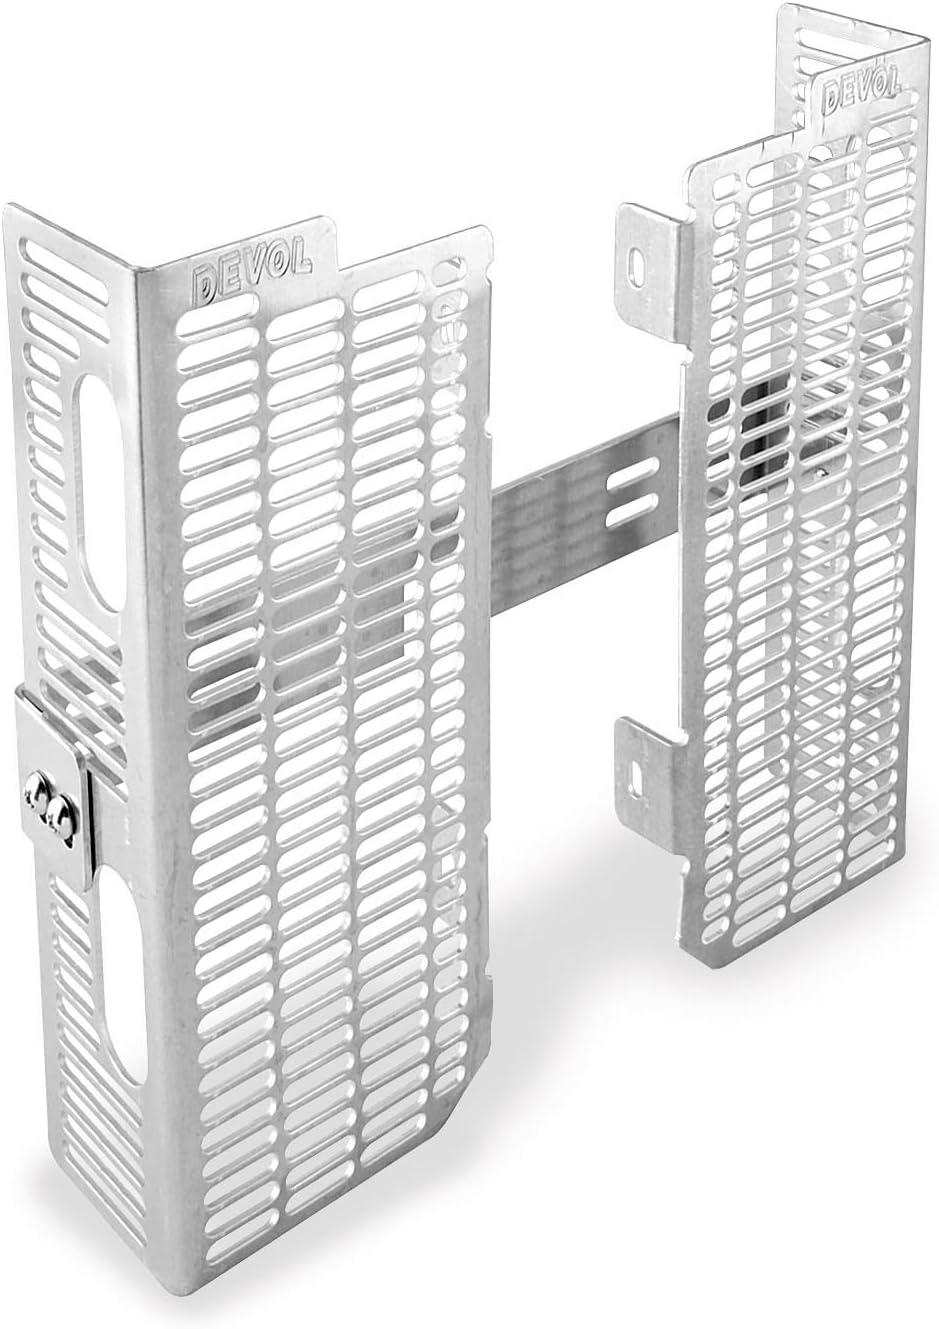 Devol Max 53% OFF Radiator Guard Aluminum for famous 250 EXC KTM 02-04